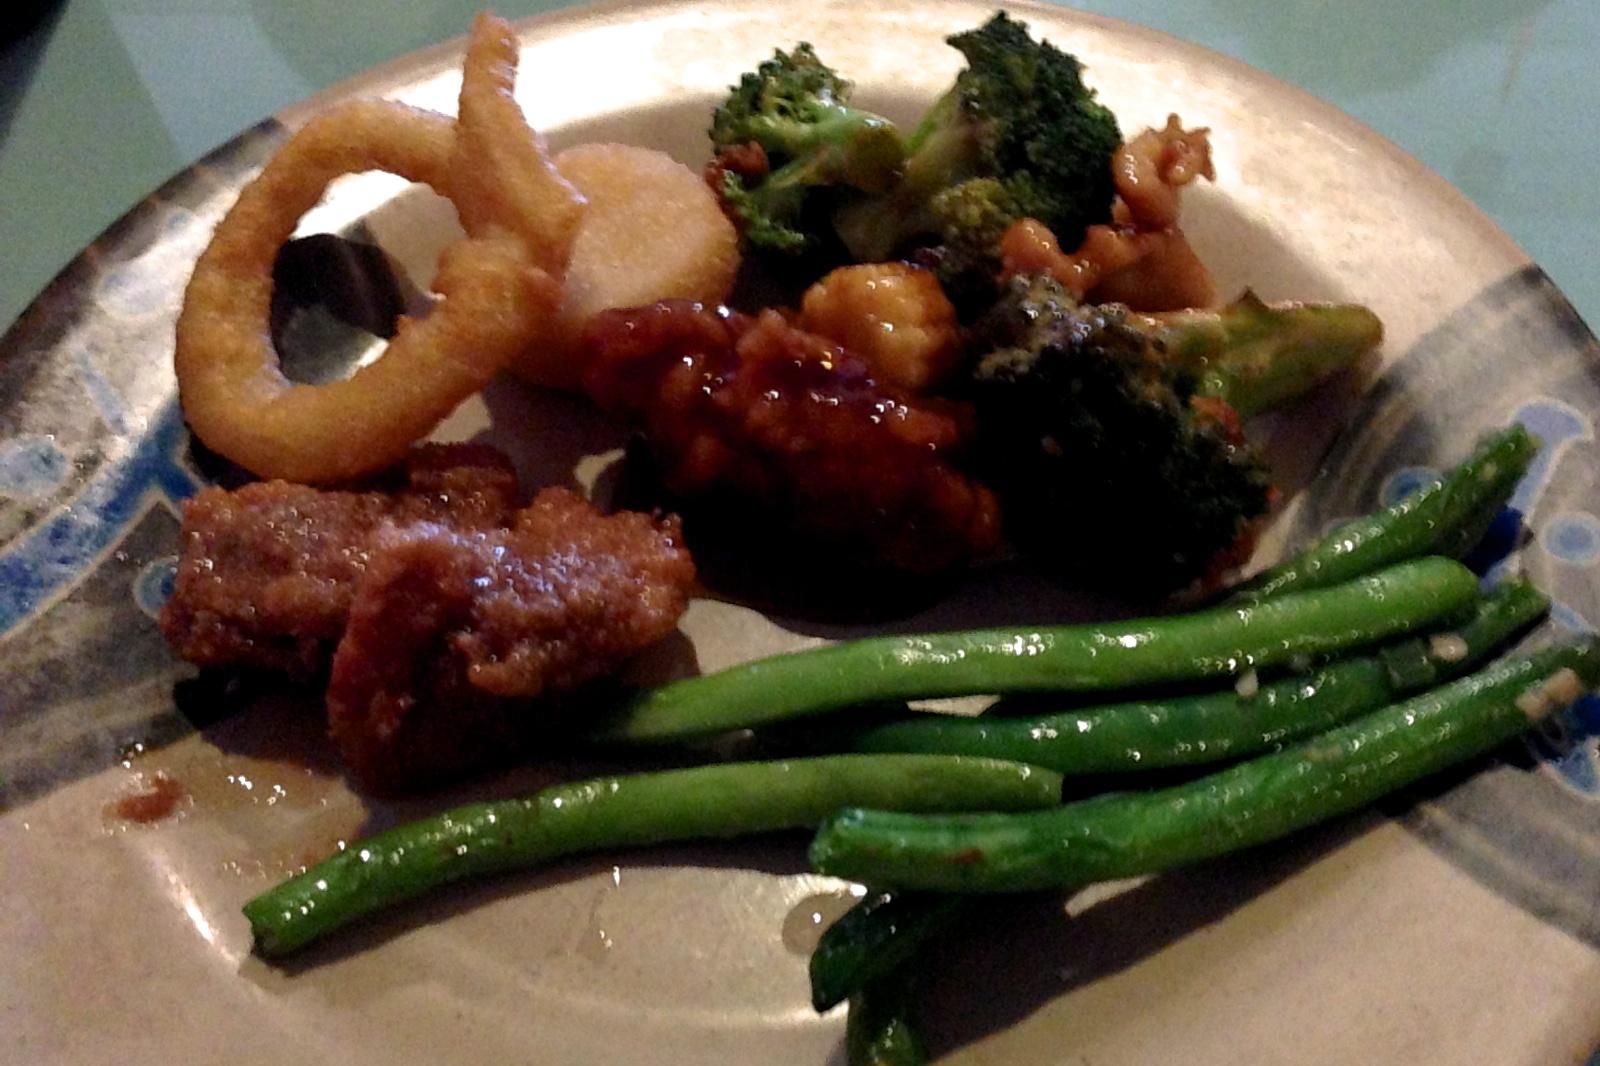 http://blog.rickk.com/food/2013/04/28/ate.2013.04.28.d2.jpg